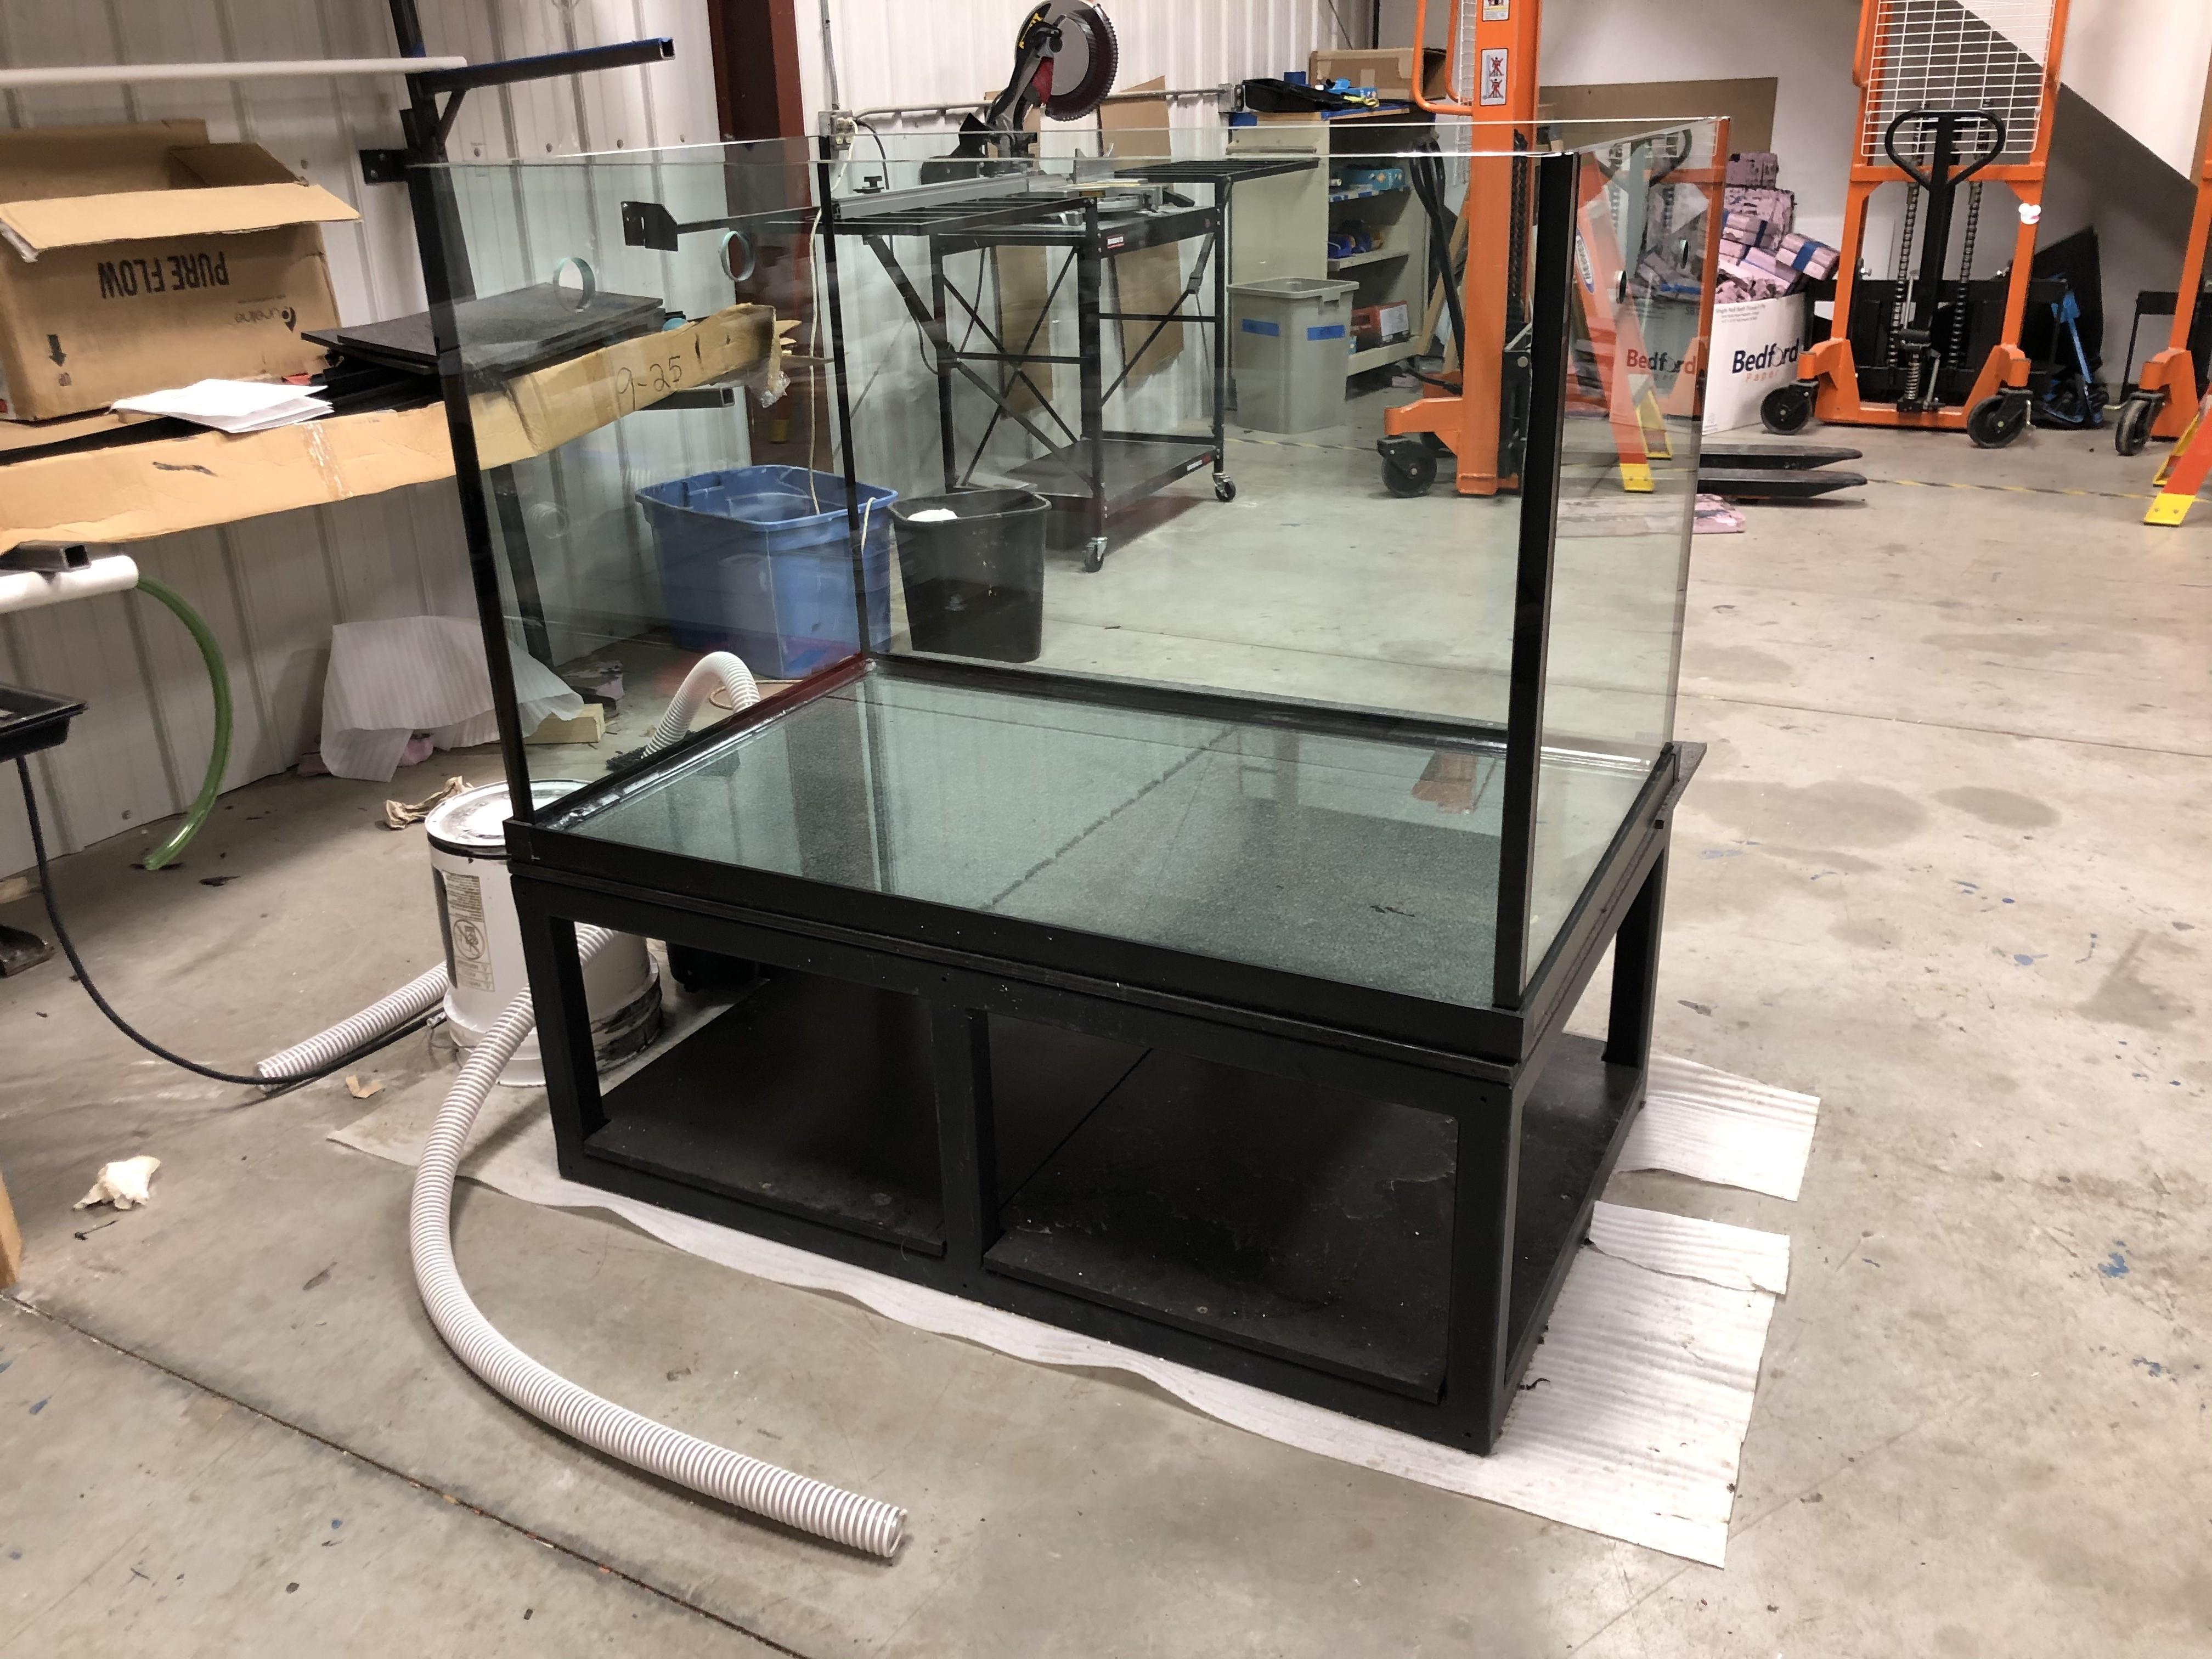 "#69 185 Gallon* Custom Size RIMLESS Aquarium: 30""Hx 48""Lx 30""W With Steel Stand"